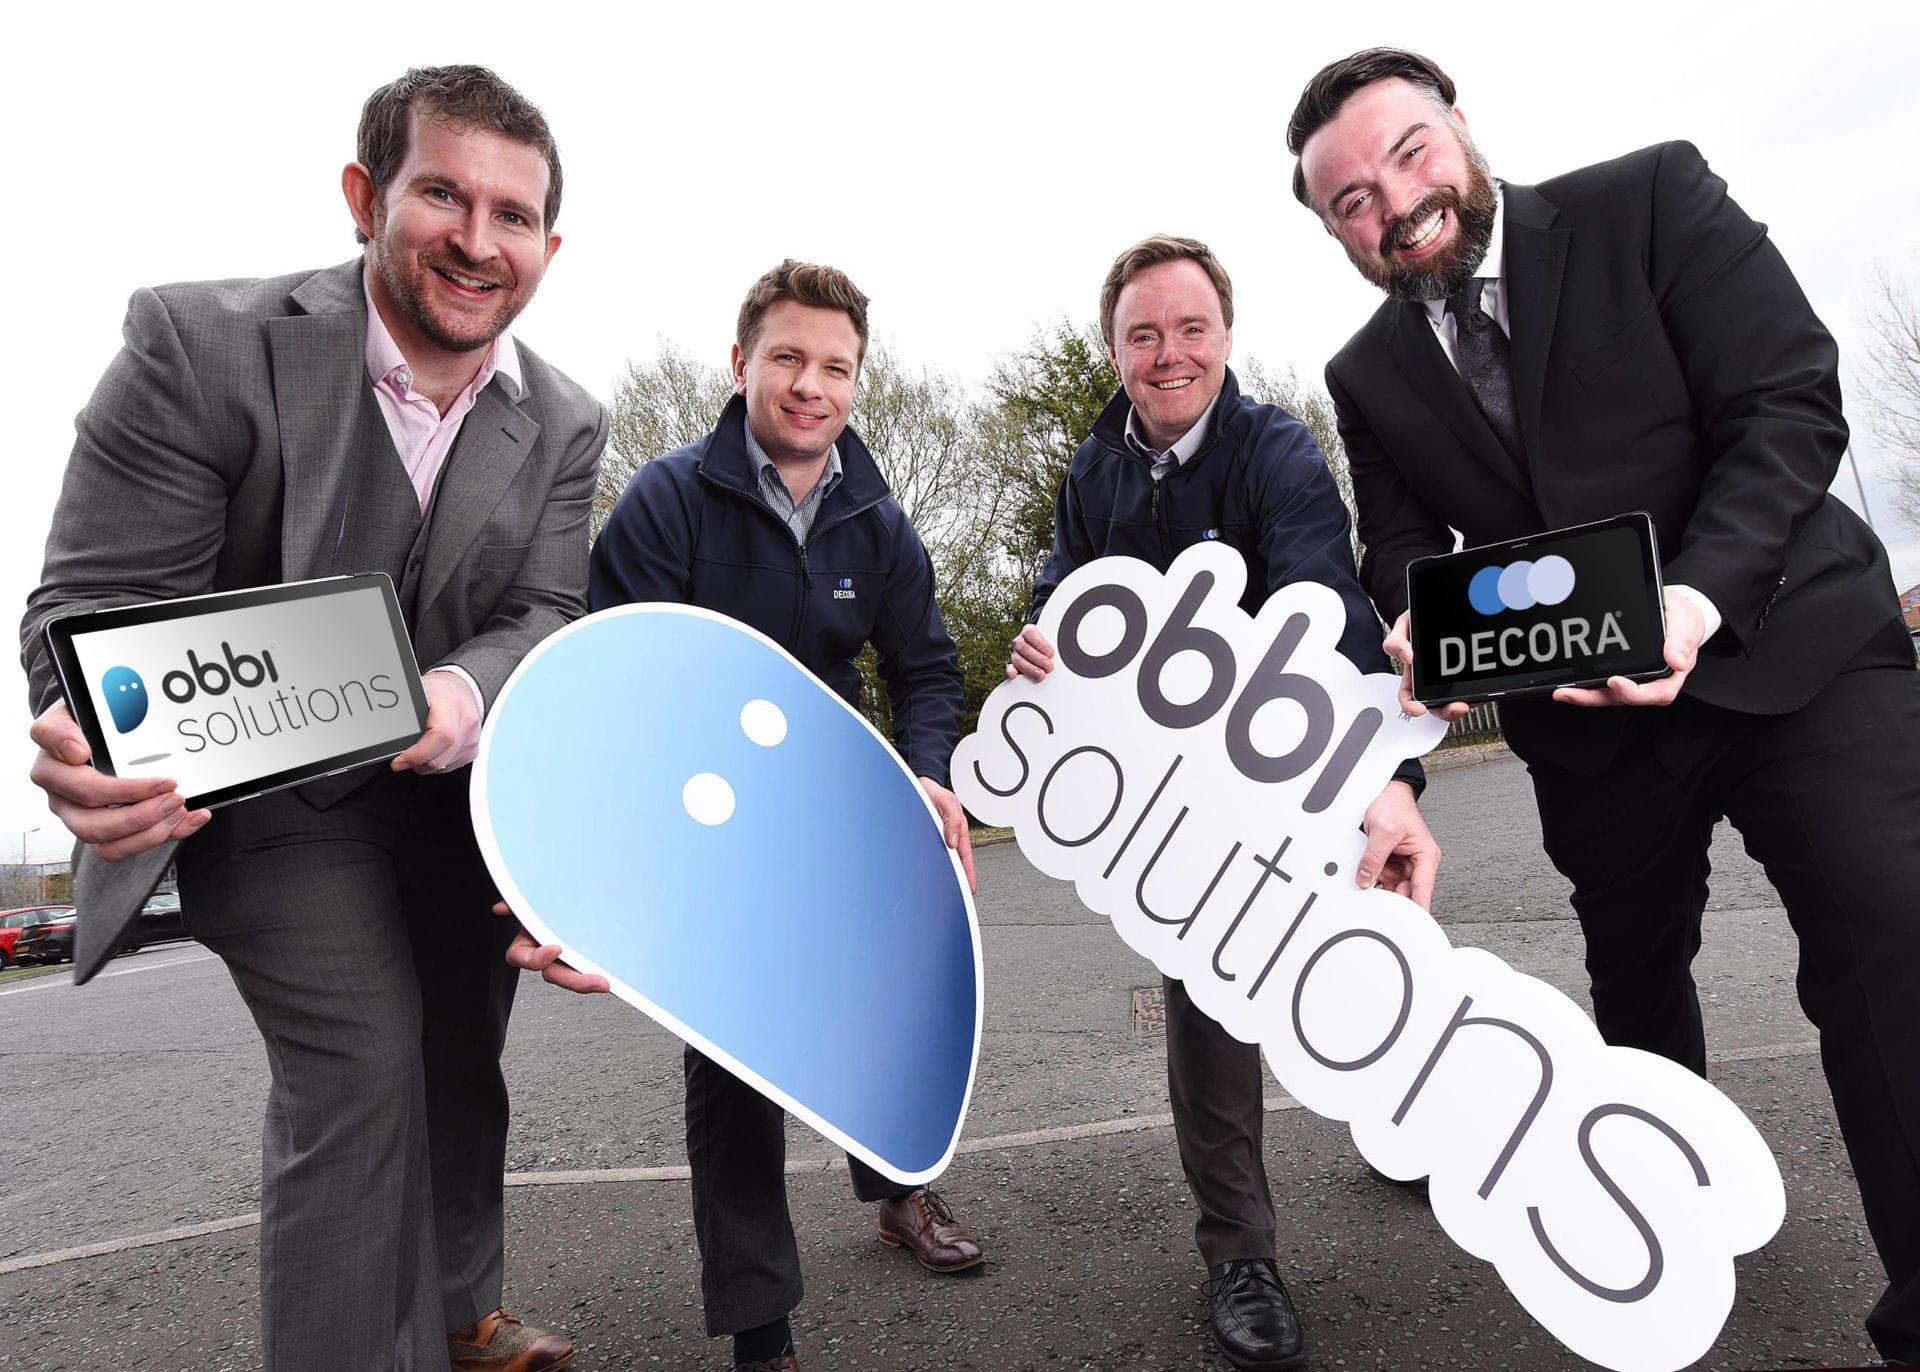 Obbi Solutions,